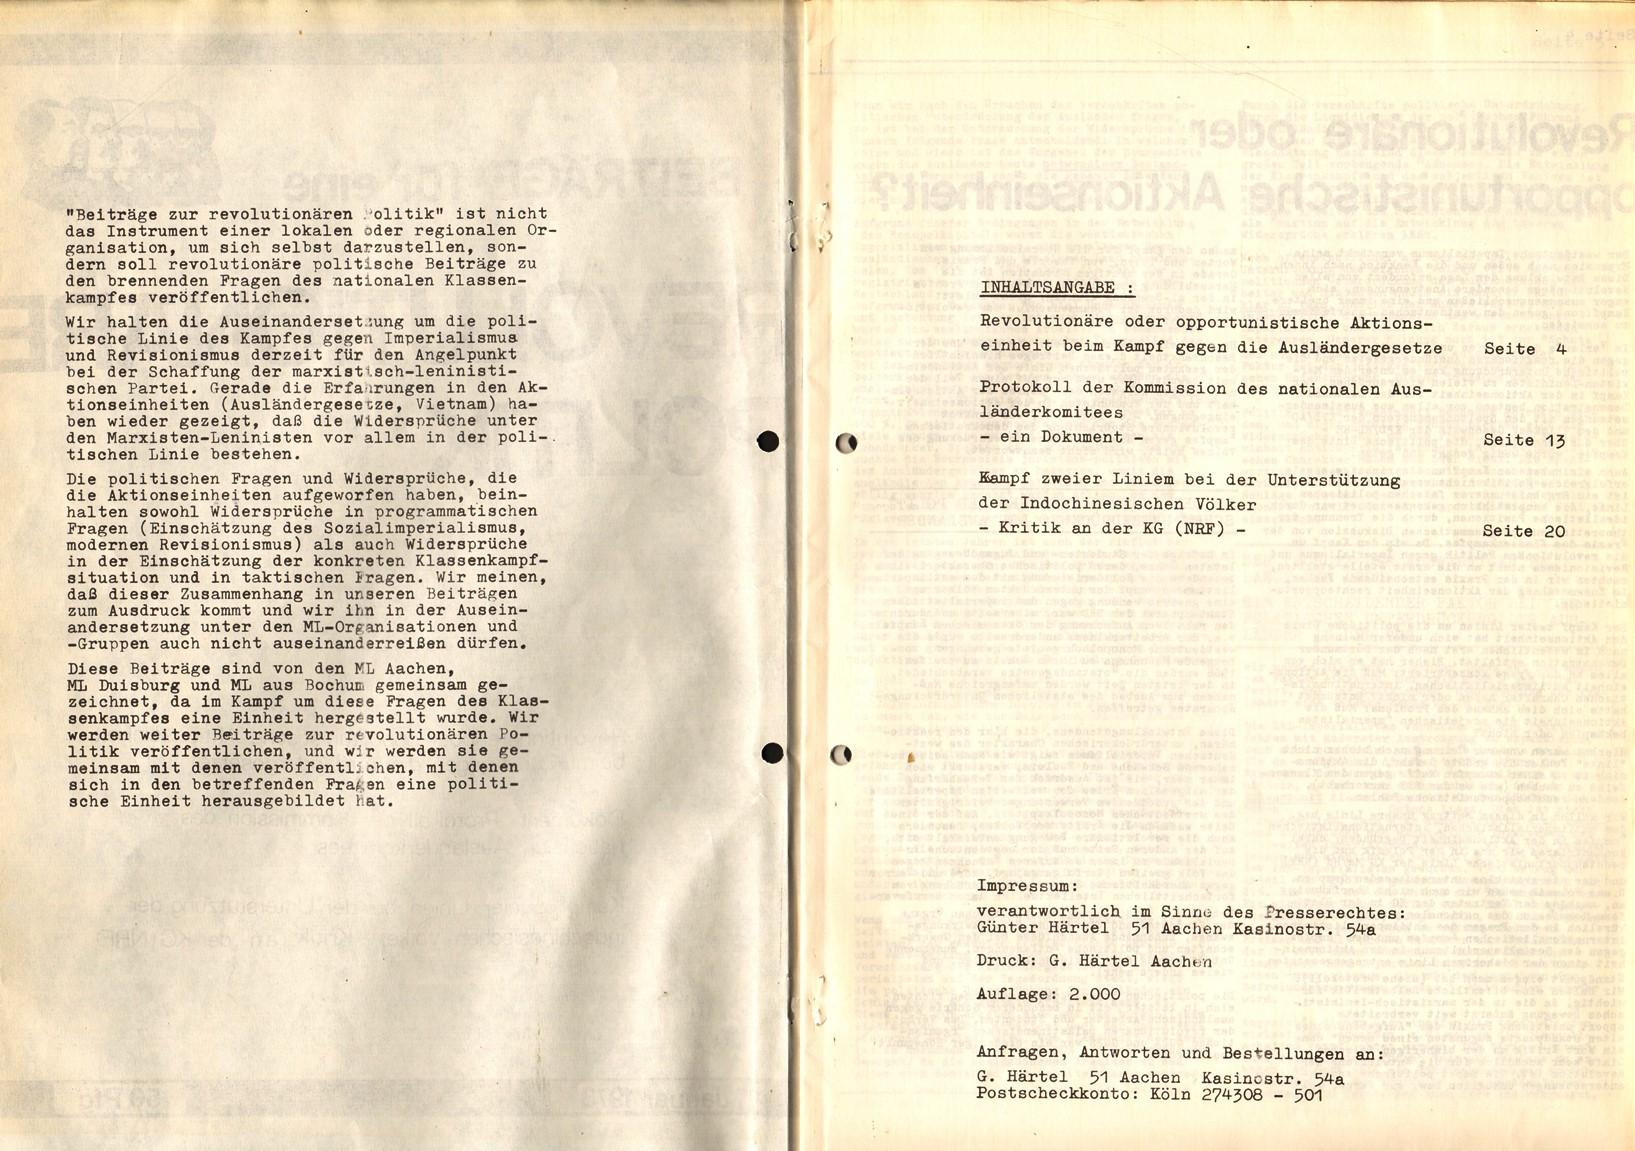 Aachen_Beitraege_revolutionaere_Politik_1973_01_02